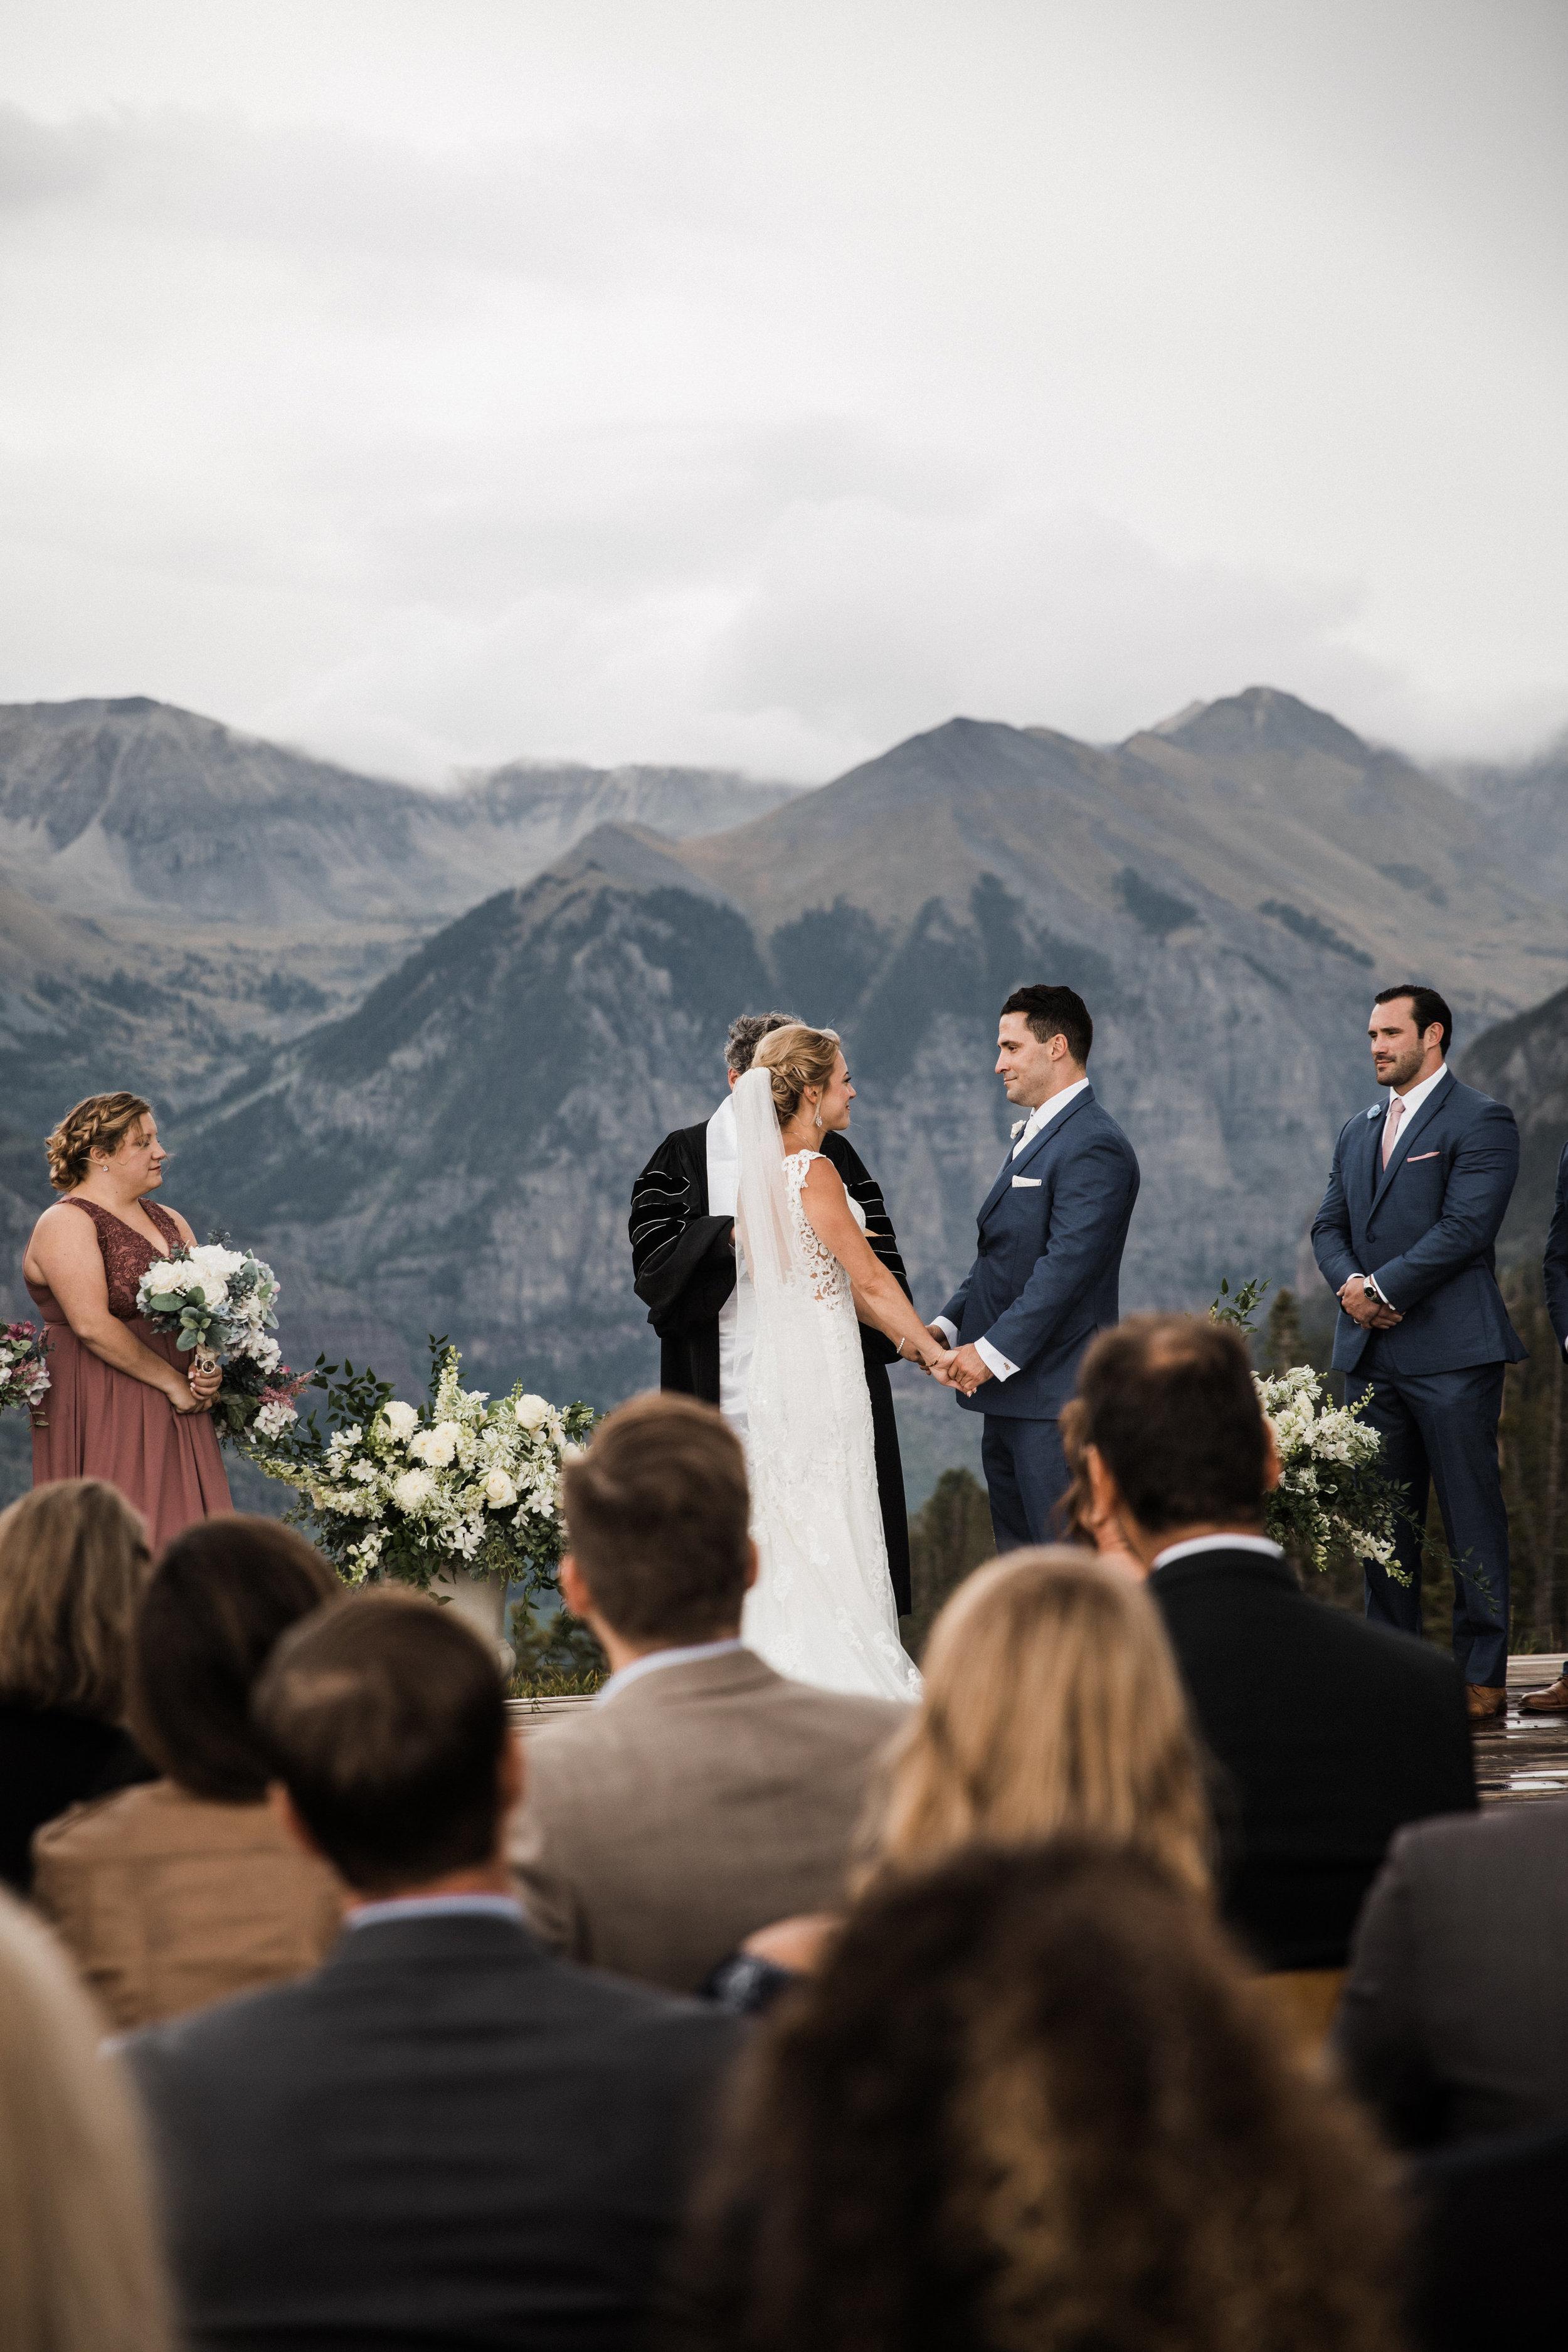 leahandashton-telluride-wedding-photography-0056.jpg